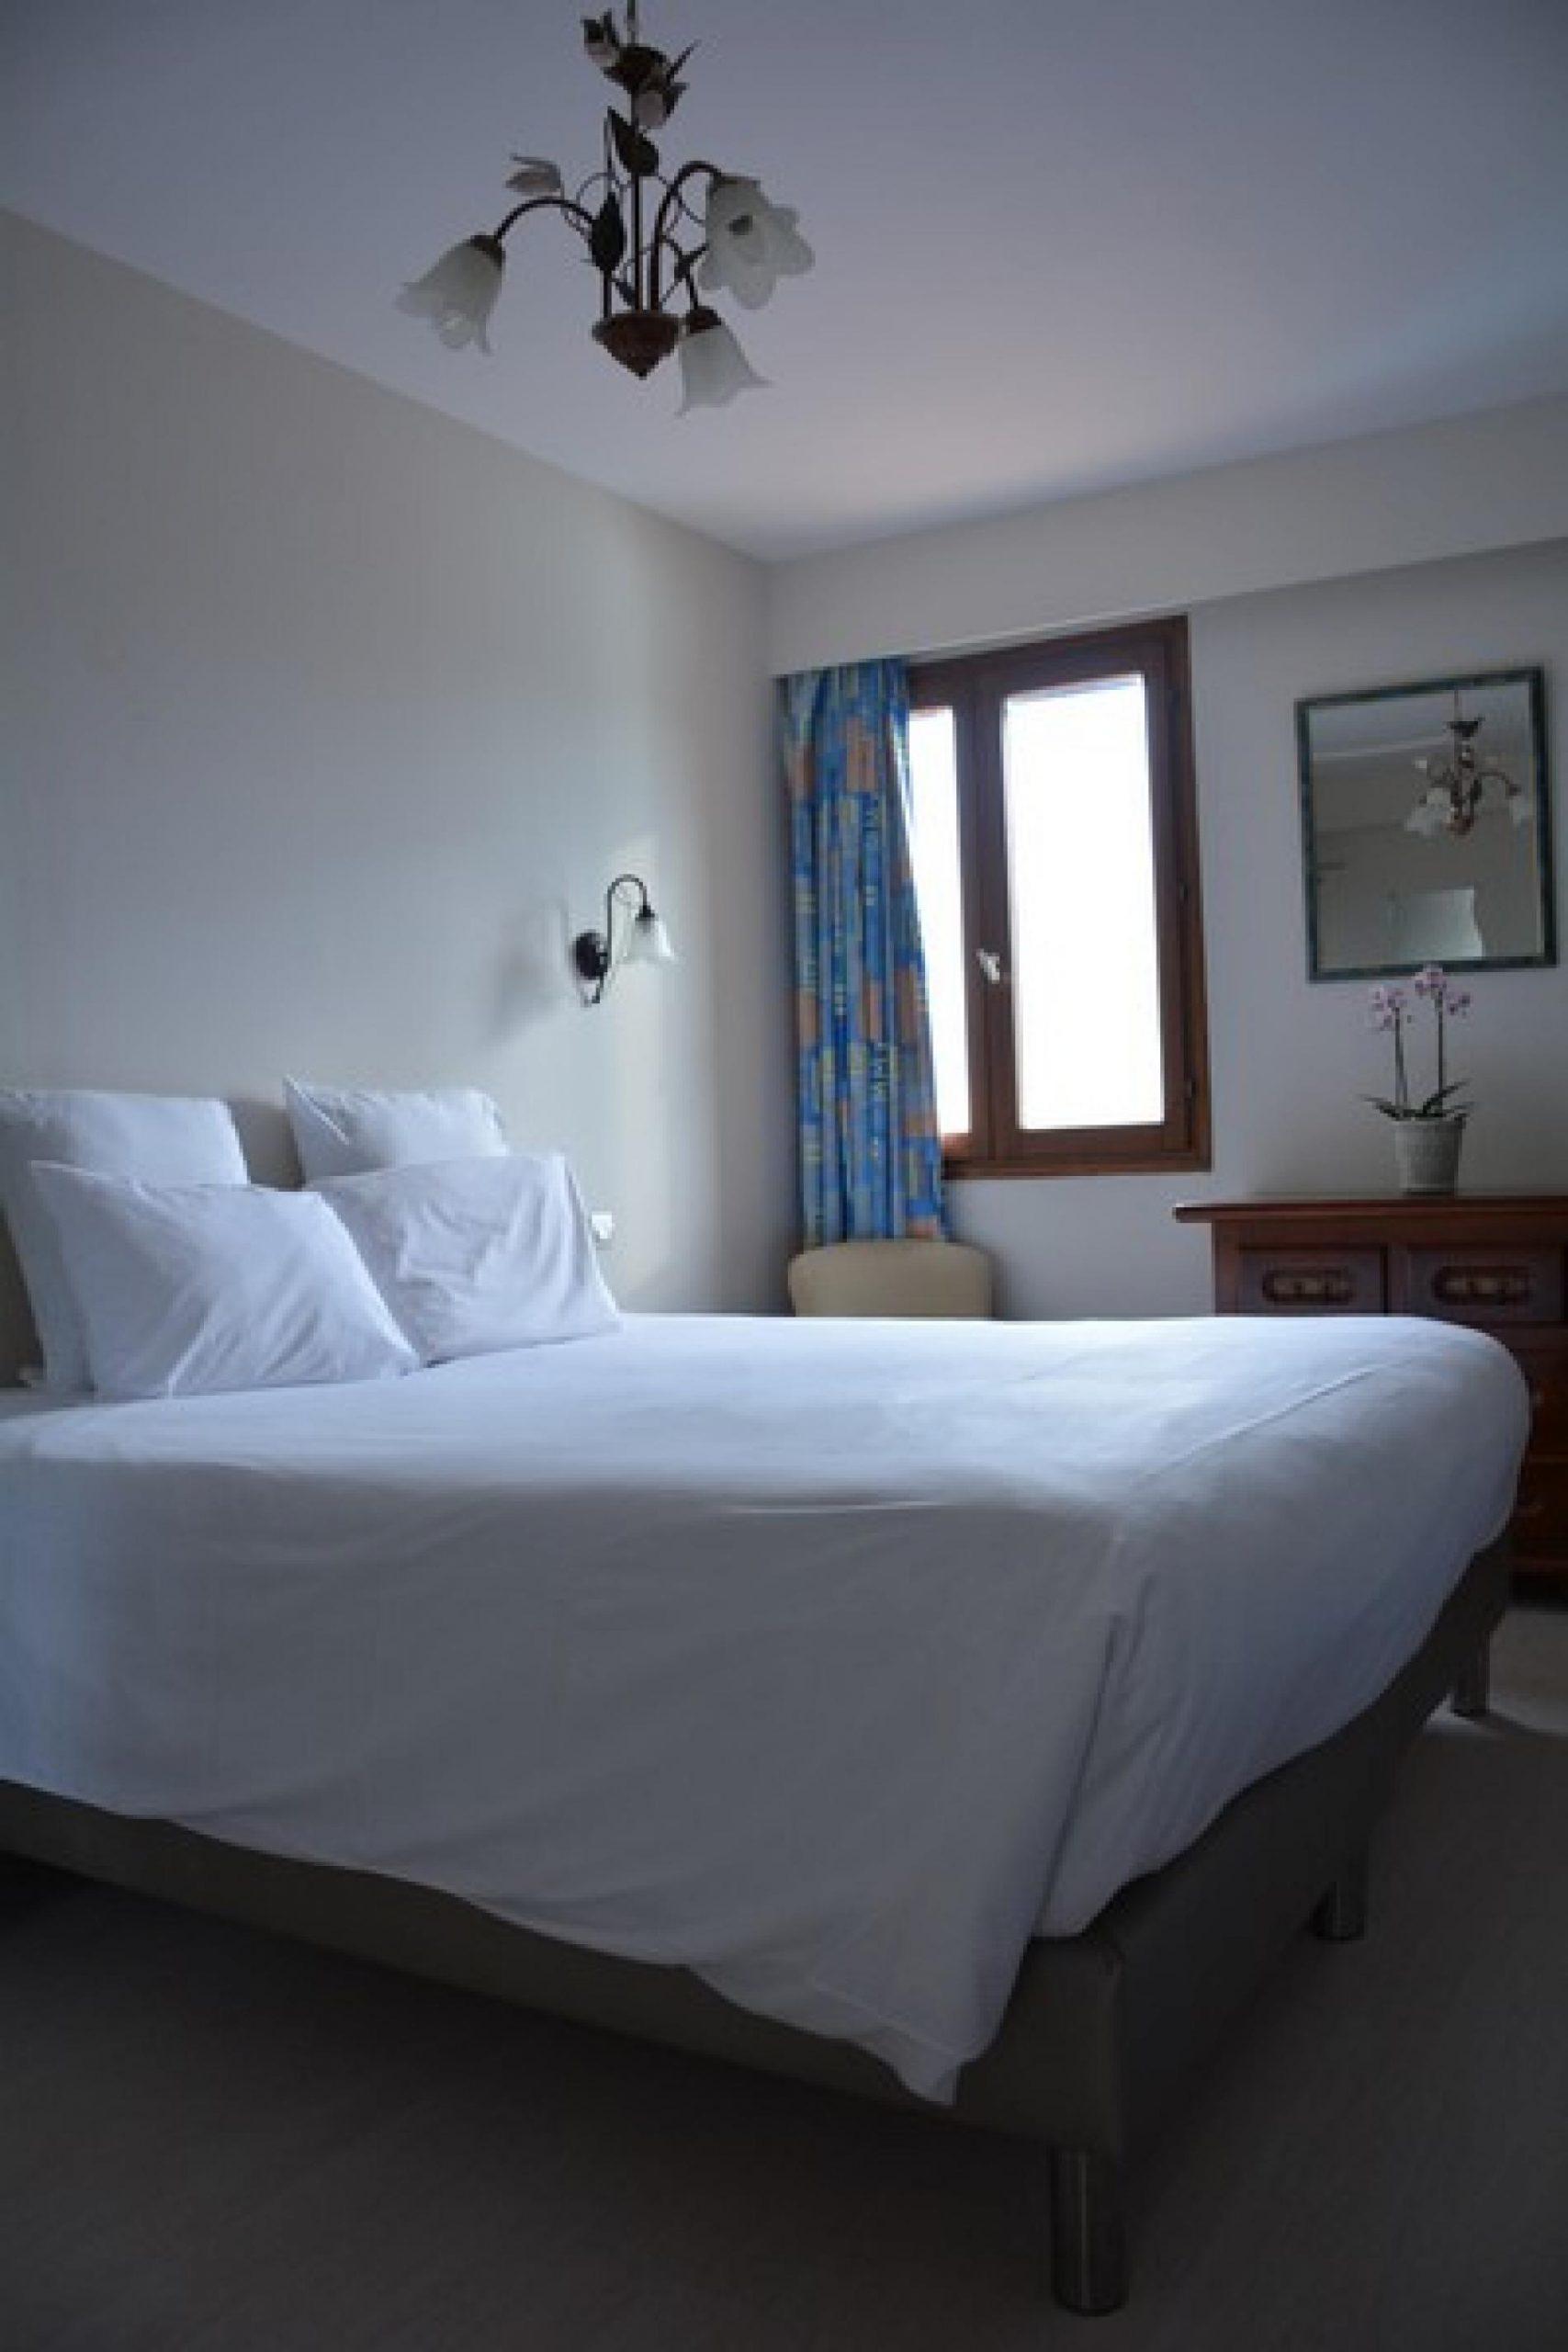 ∞ Hotel Deauville Avec Piscine - Hotel 3 Étoiles Deauville ... dedans Horaires Piscine Deauville